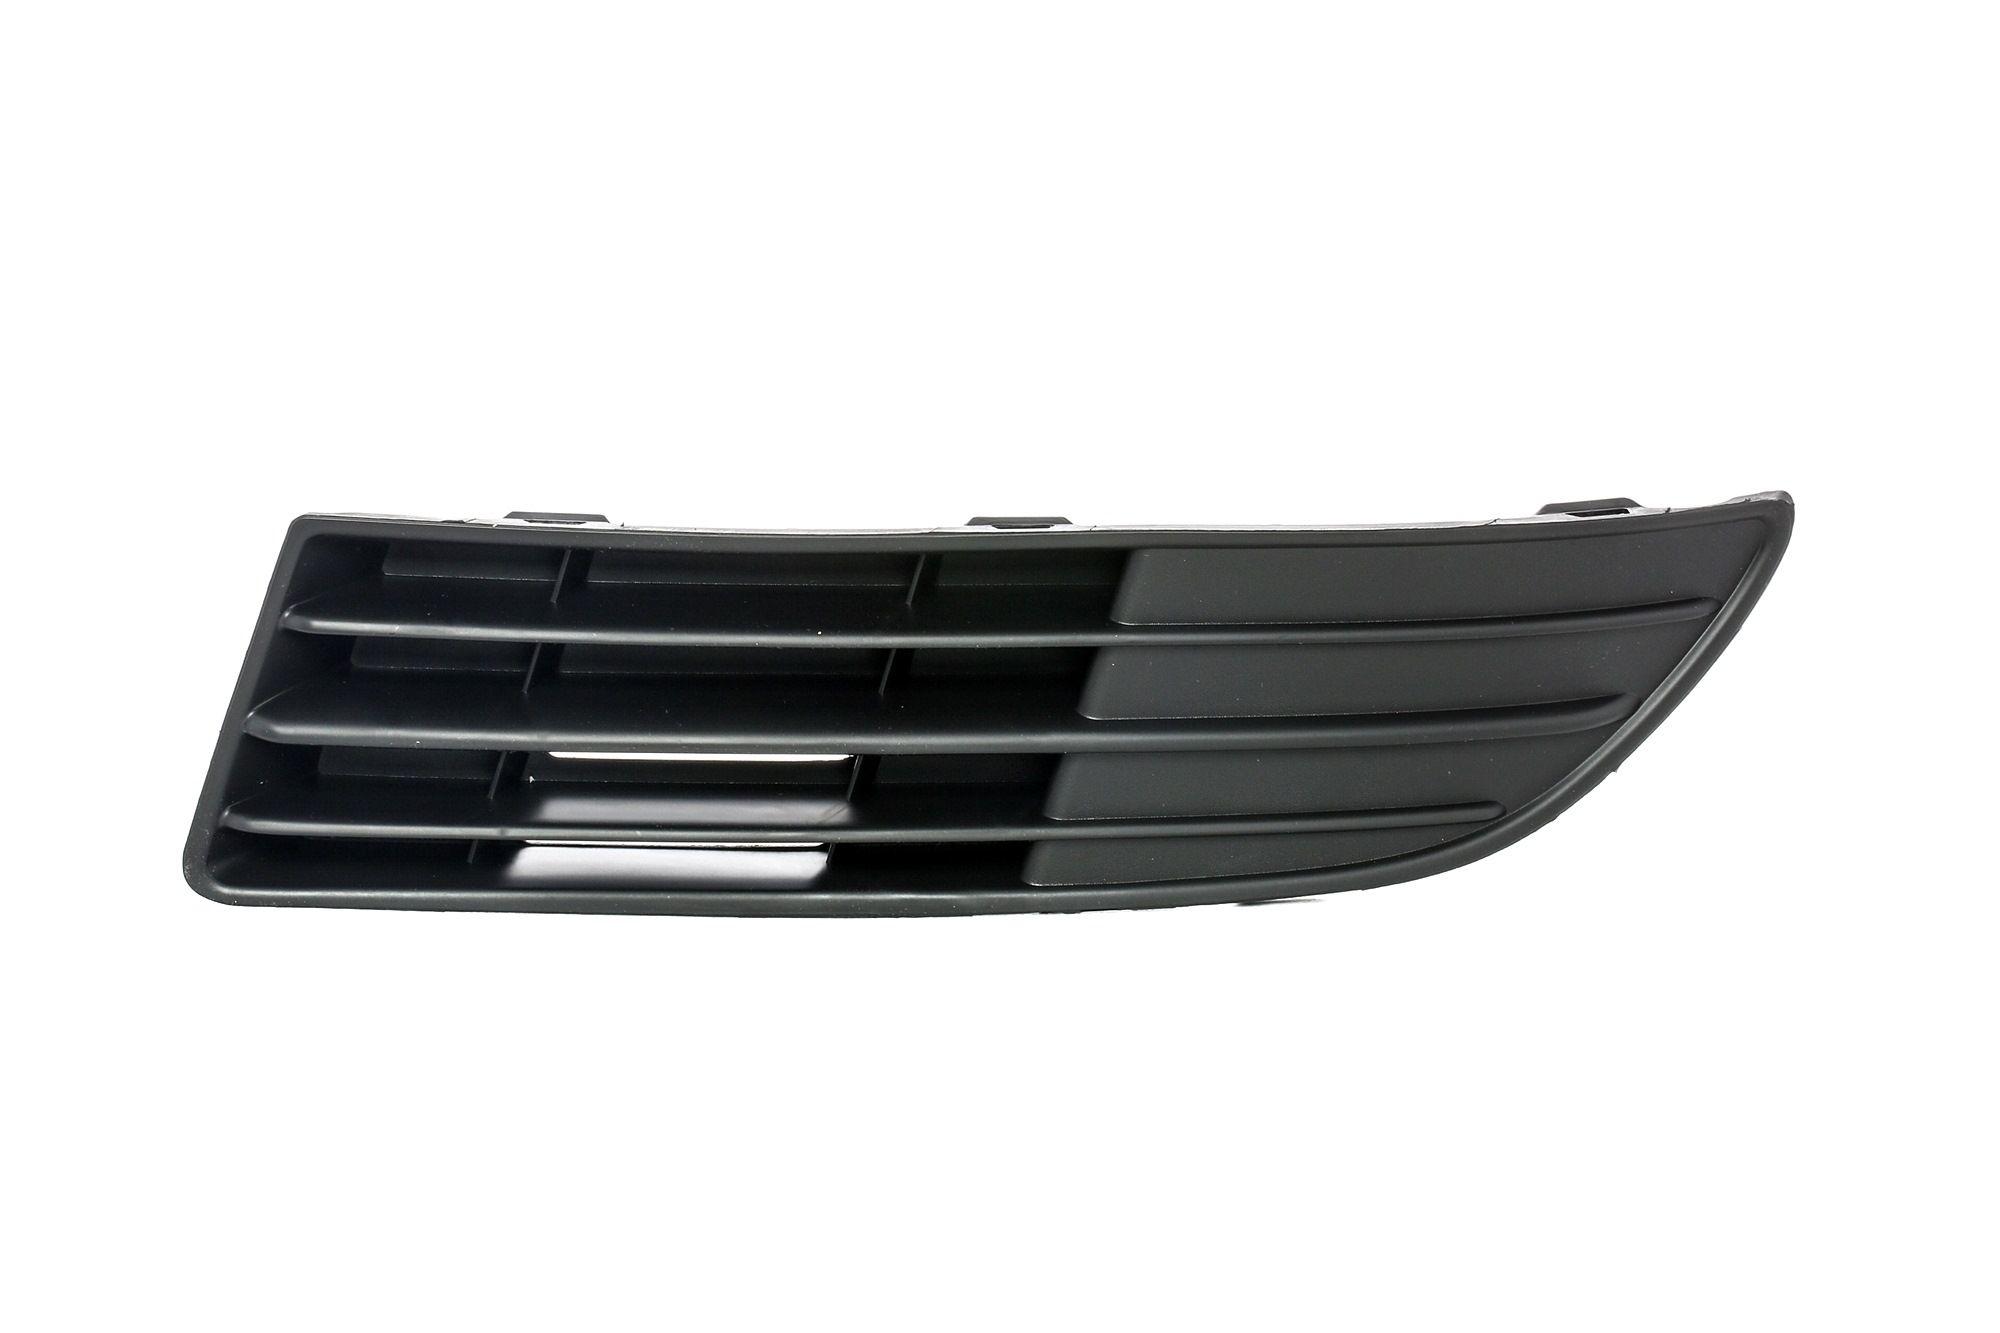 Stoßstange Gitter PRASCO VG0222124 Bewertung